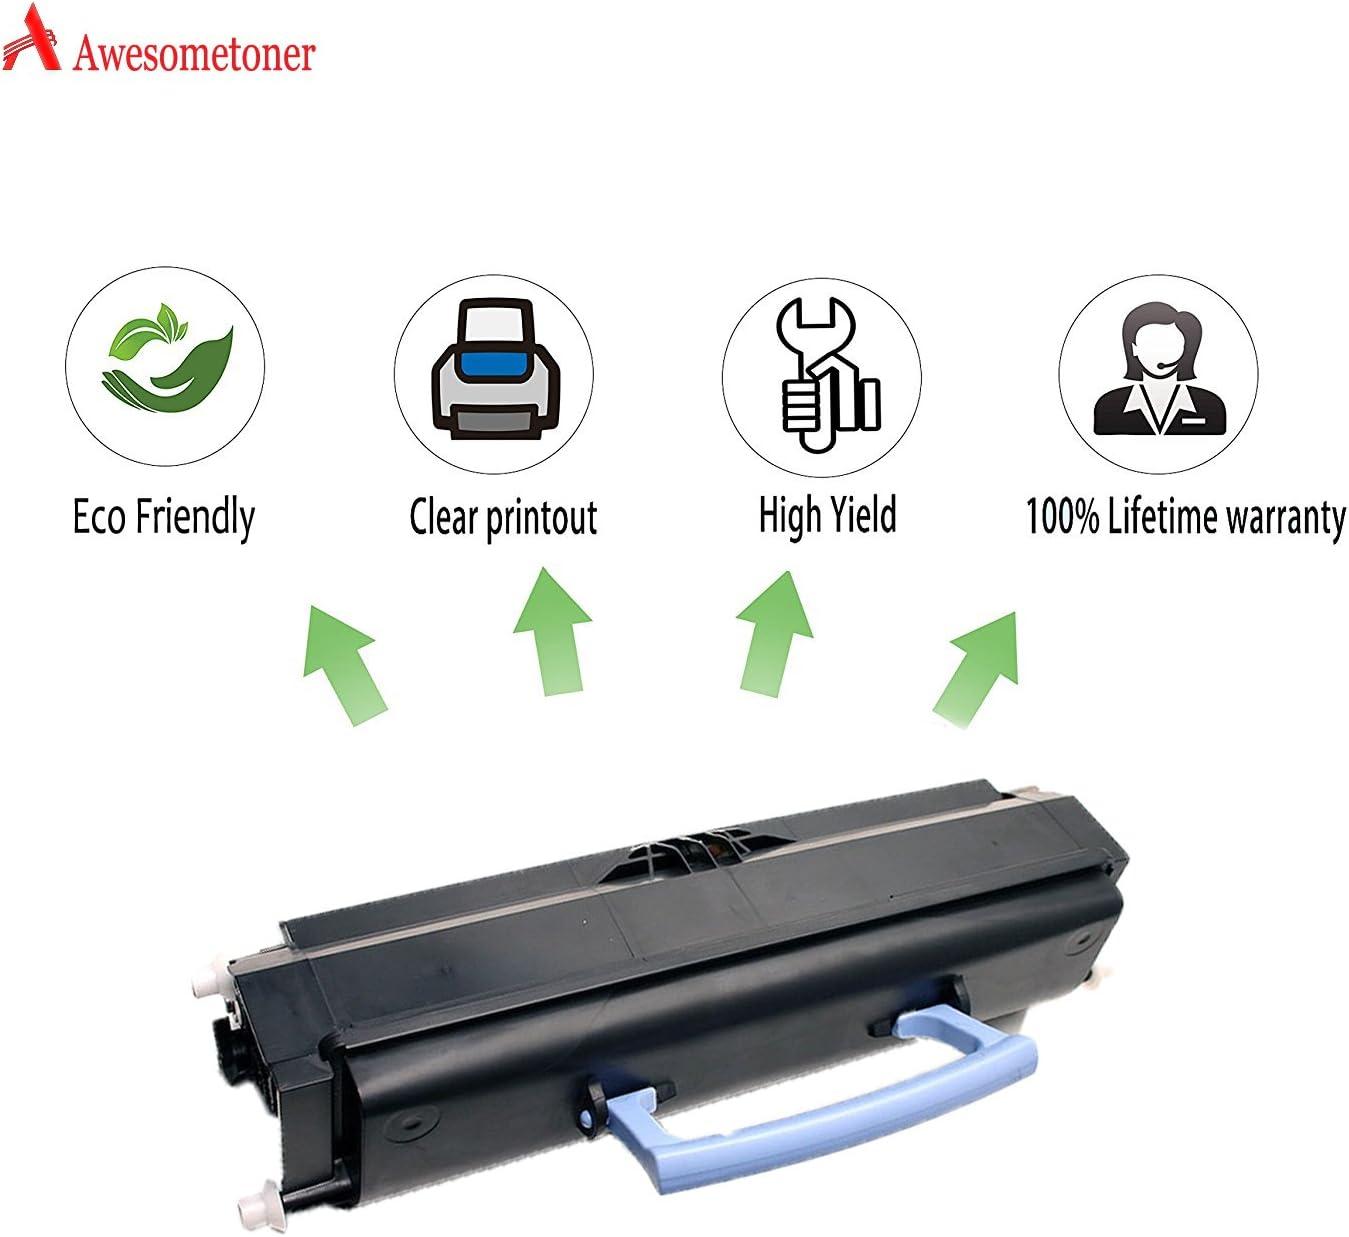 E232 E234n E234 Black, 5-Pack E232t Awesometoner/Remanufactured/Made in USA Toner/Cartridge/Replacement/for/Lexmark 12A8305 E330 use/with/E230 E234tn